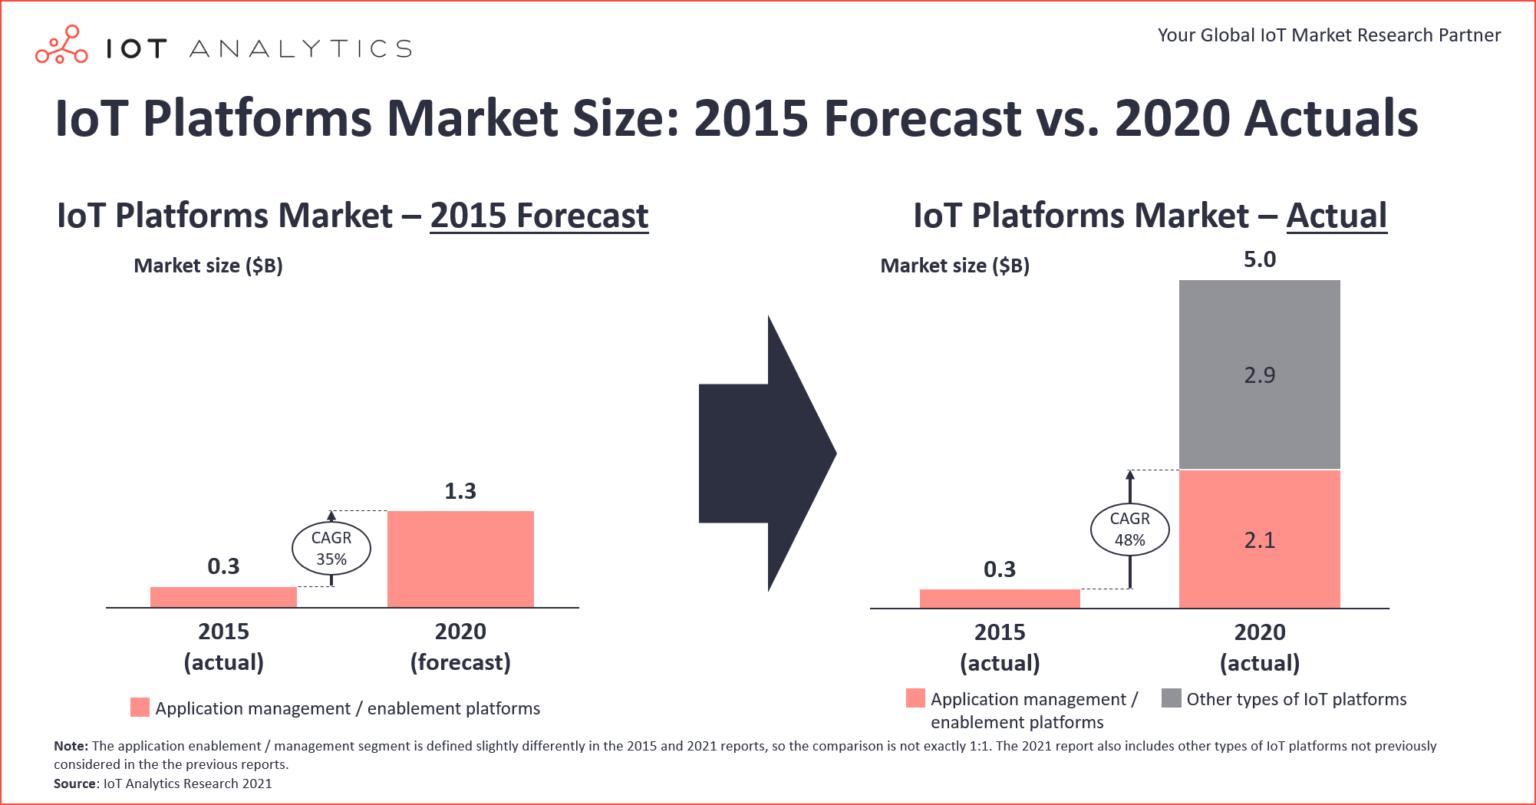 IoT-Platforms-Market-Size-2015-Forecast-vs-2020-Actuals-1536x805.png (210 KB)